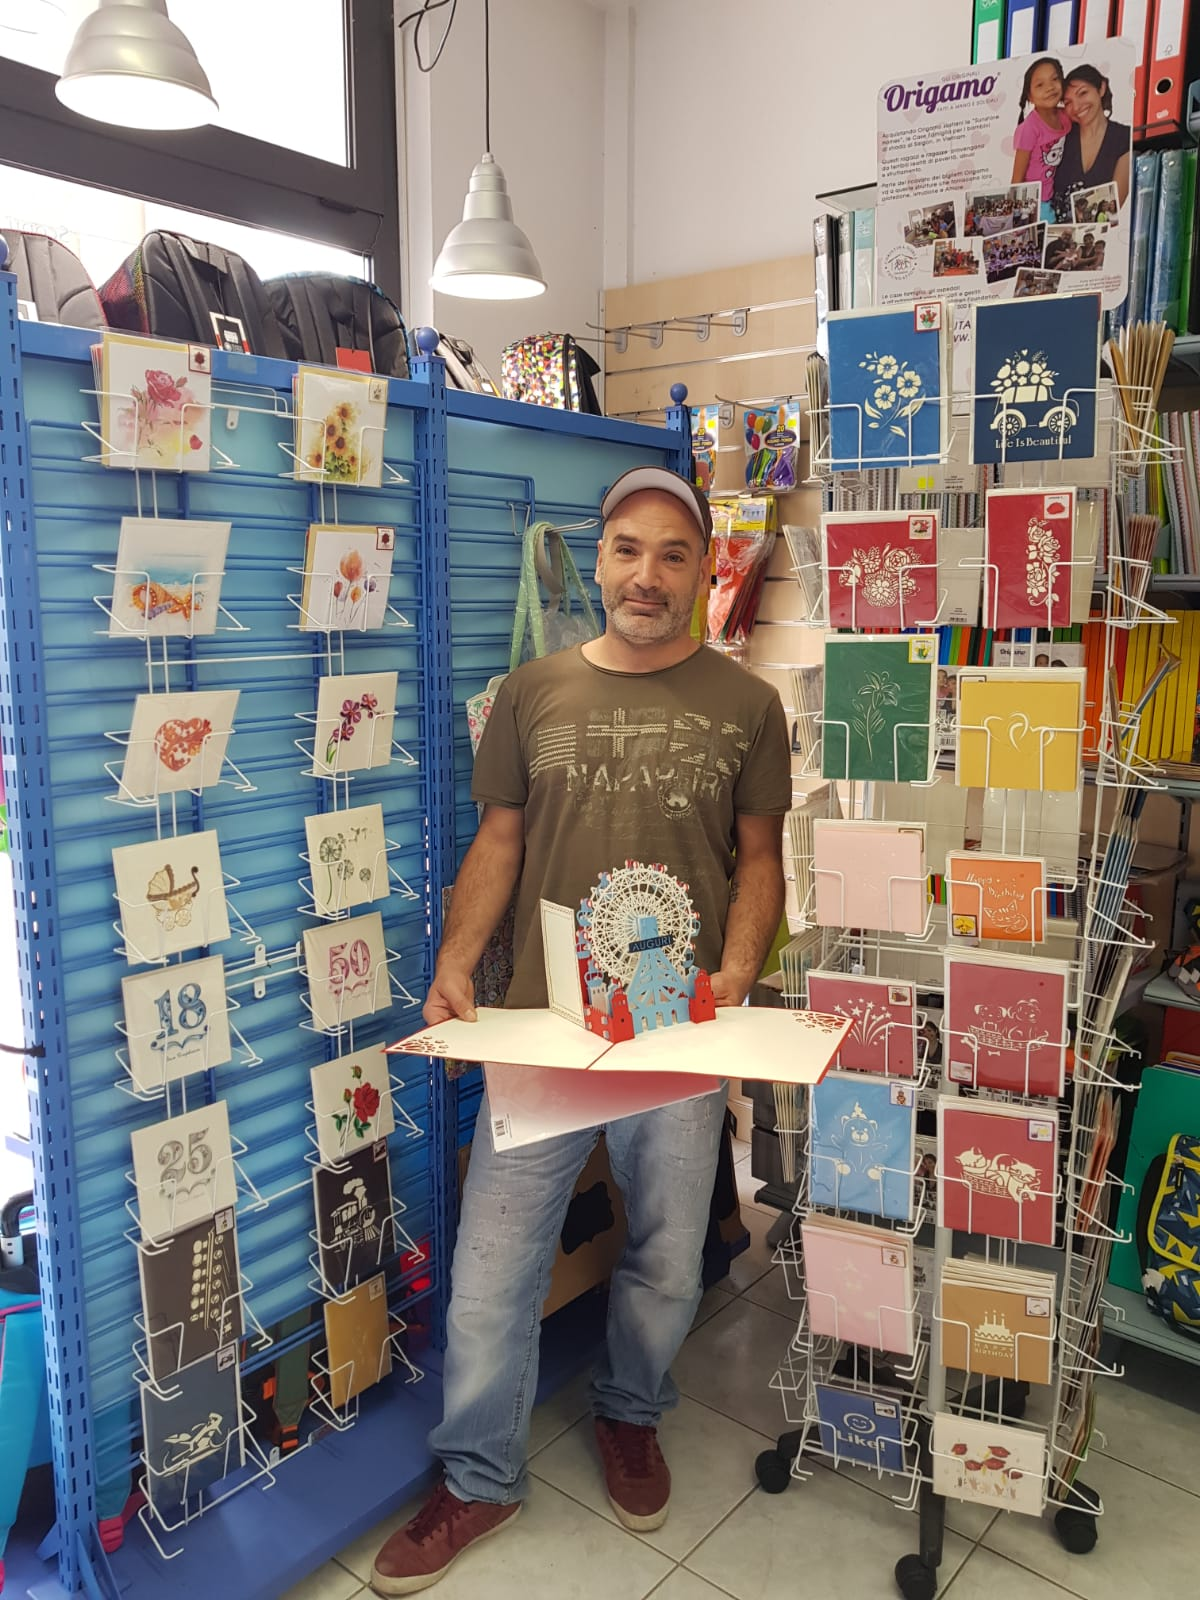 Cartolinea di Lenzini Roberto